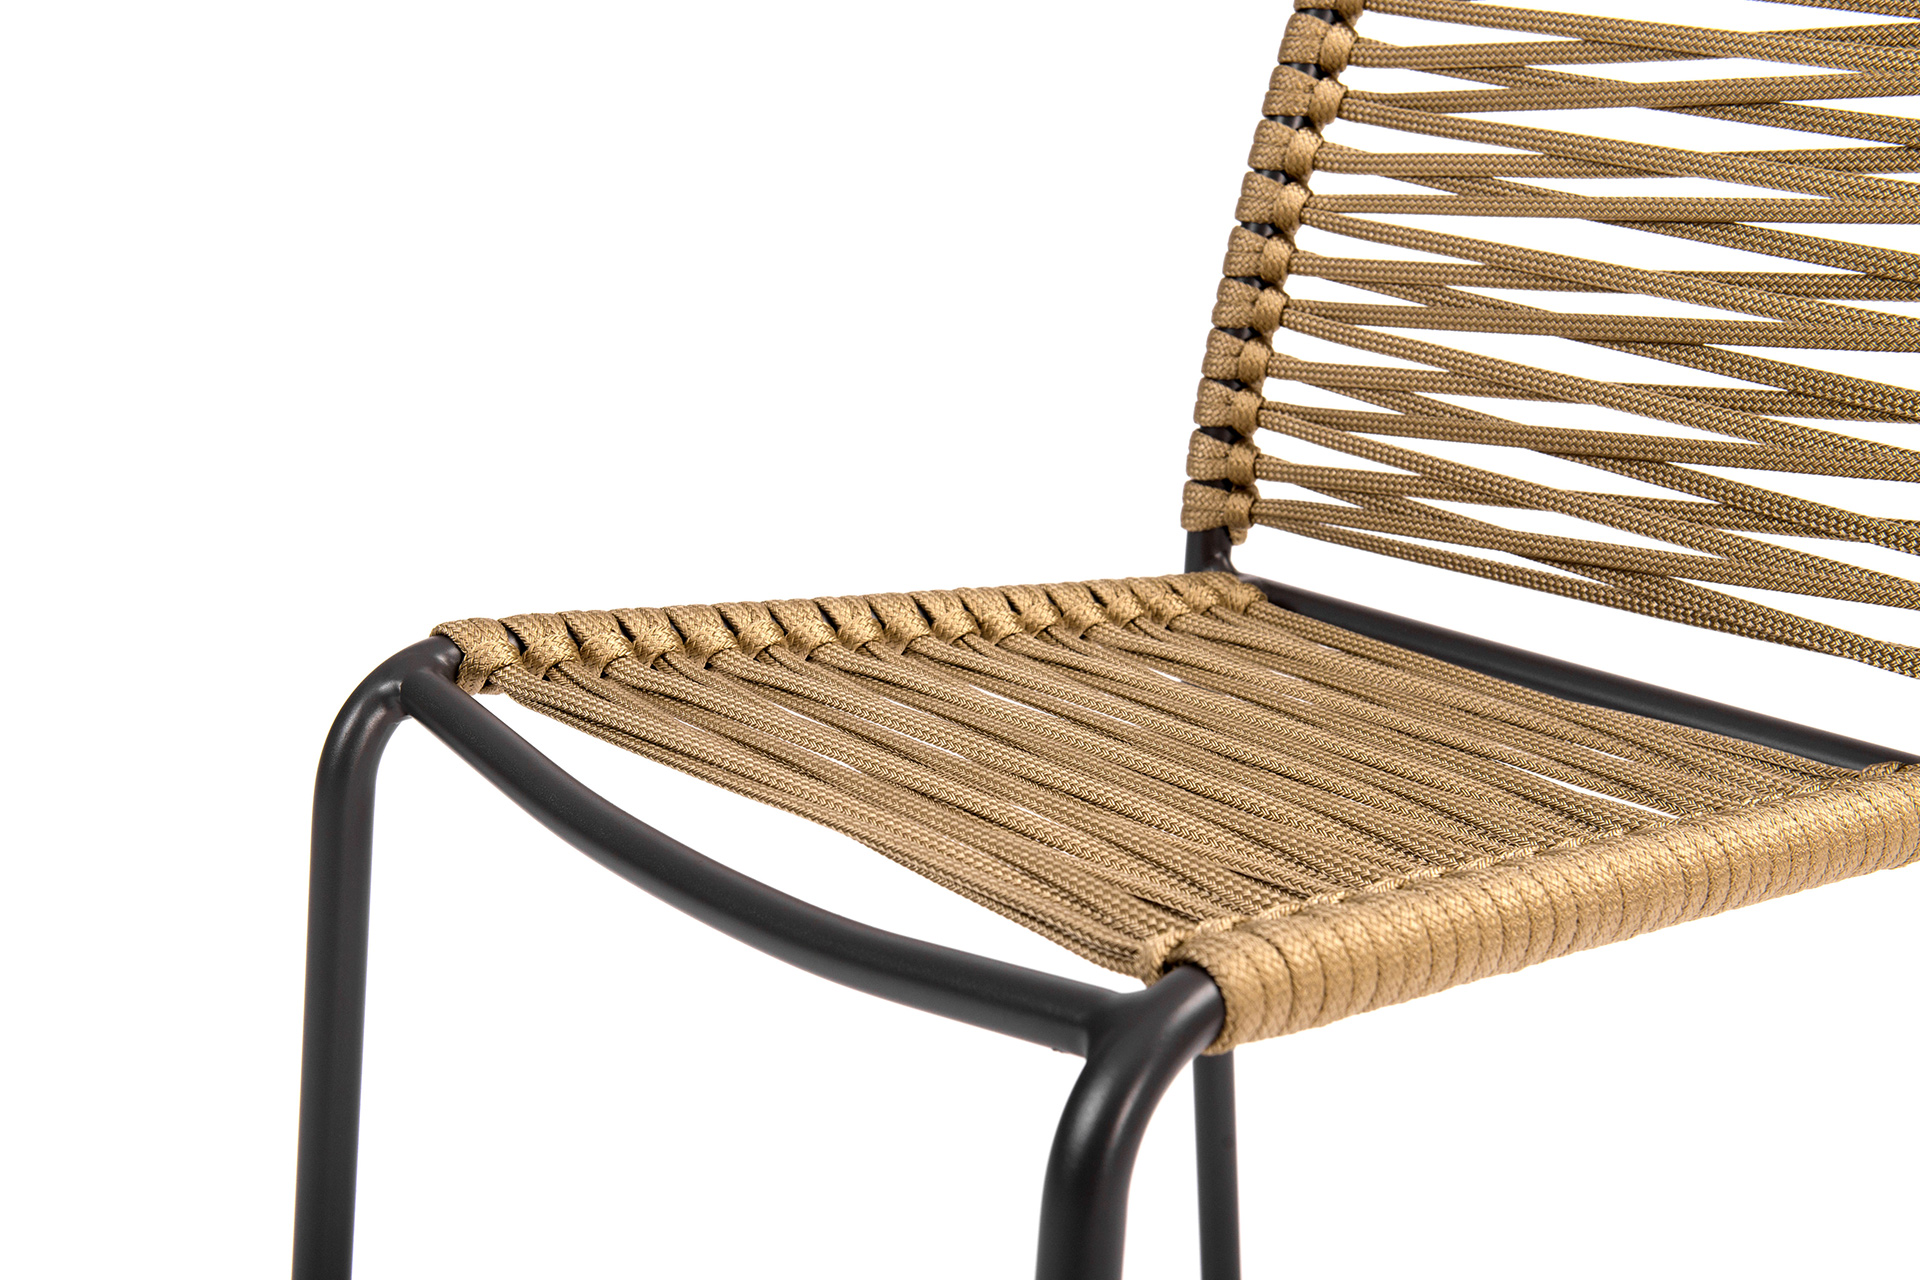 Cortina Chair Deco Seating